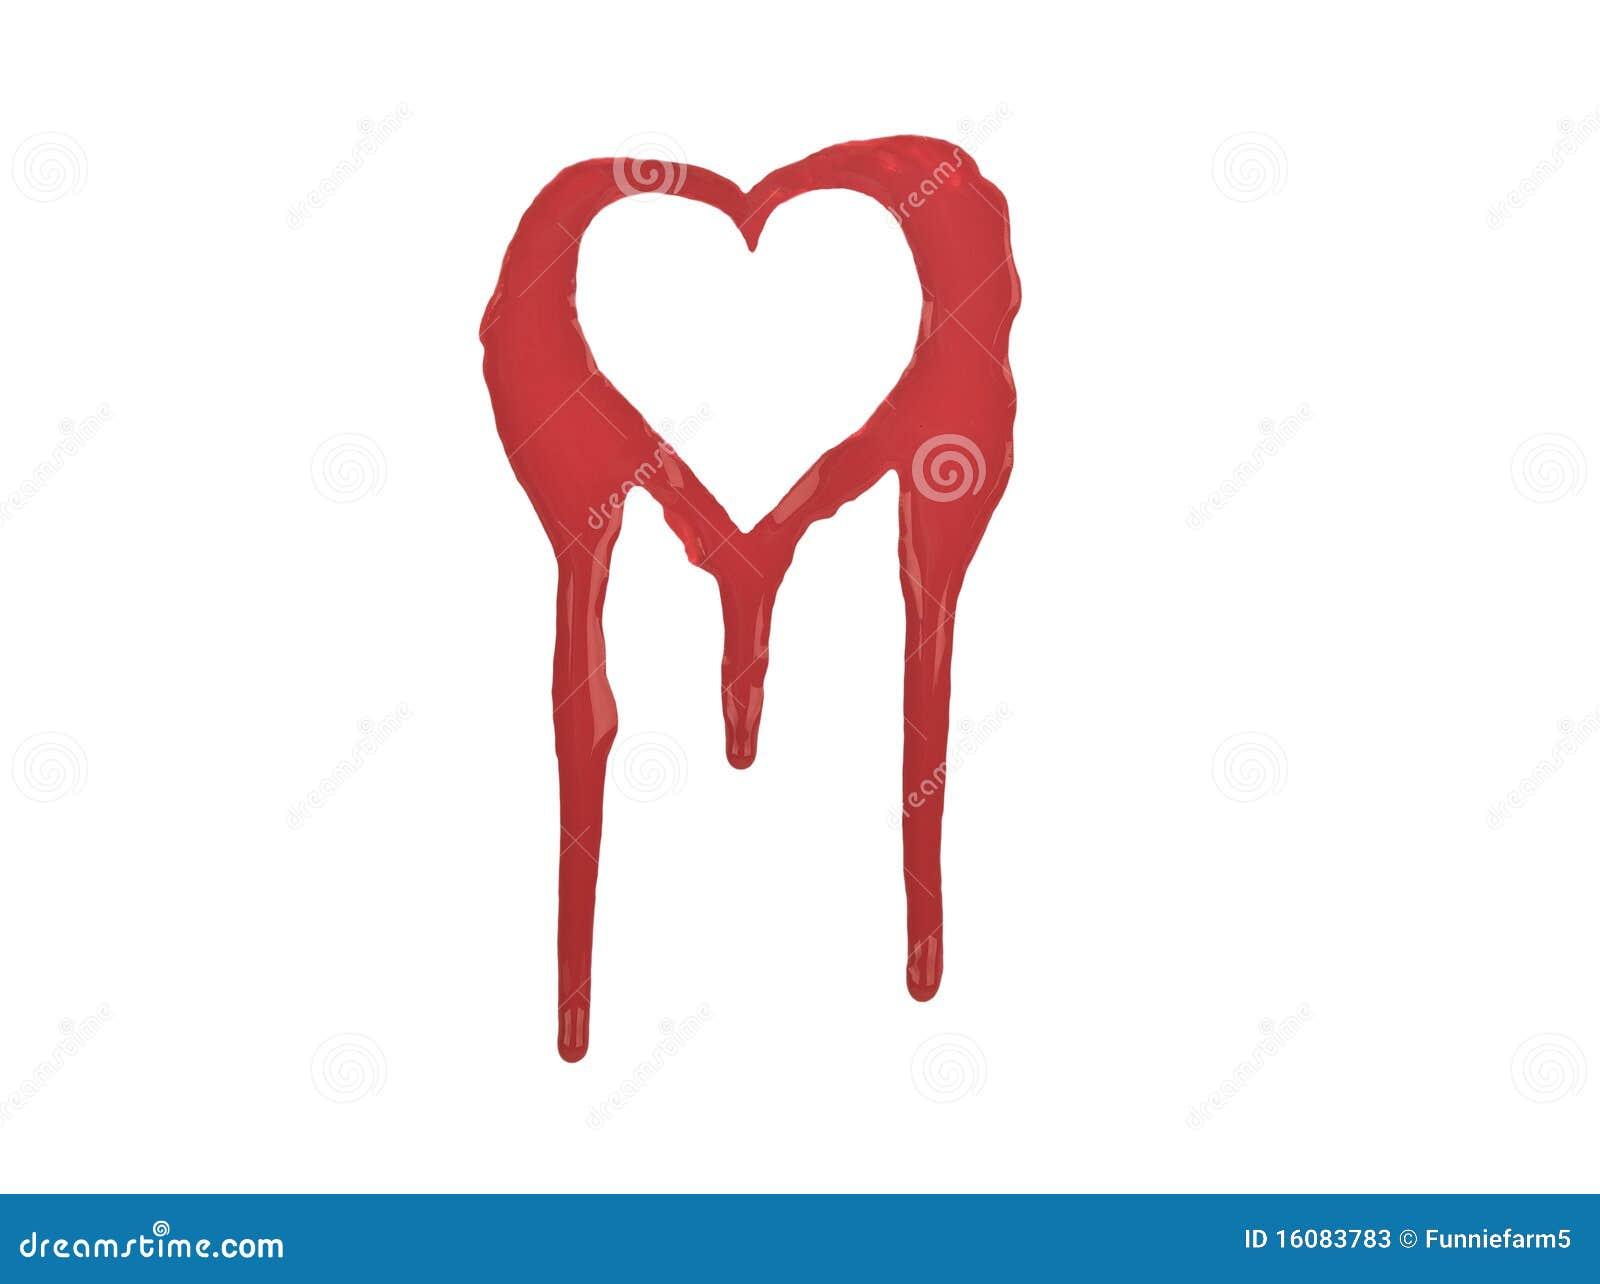 Red outline of bleeding heart isolated on white stock image royalty free stock photo buycottarizona